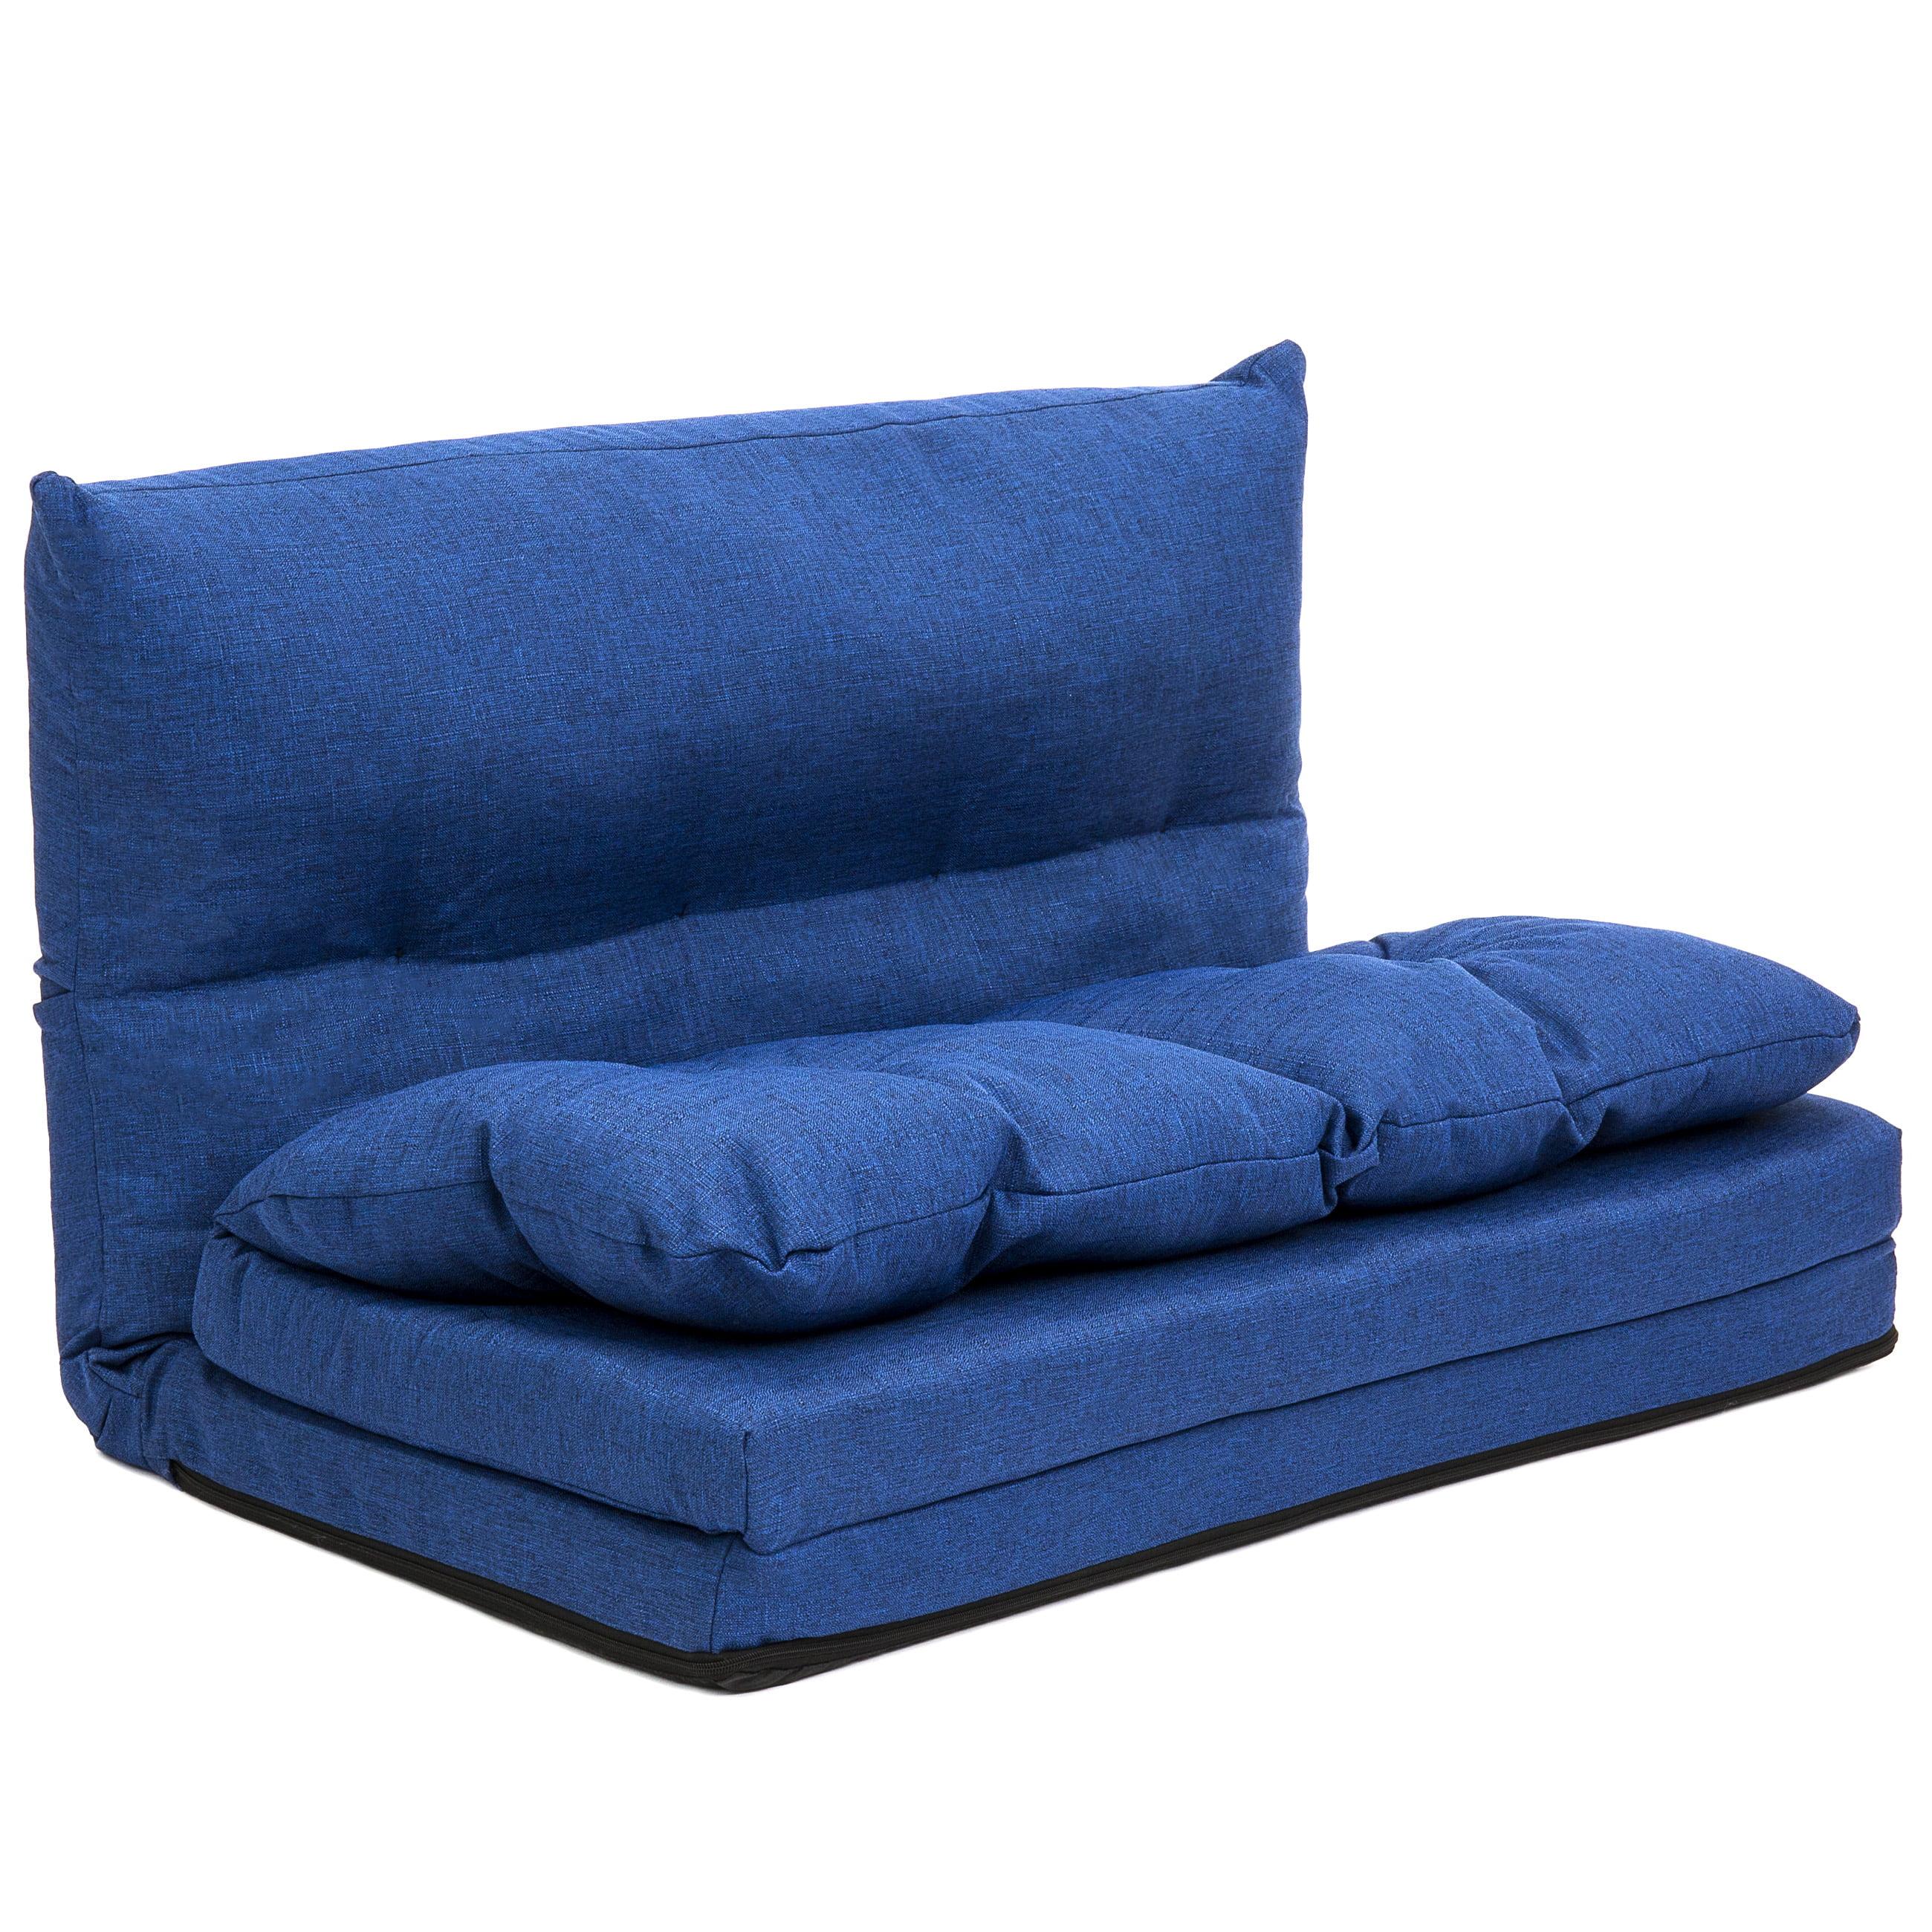 Best Choice Products Linen Folding Futon Chaise Lounge